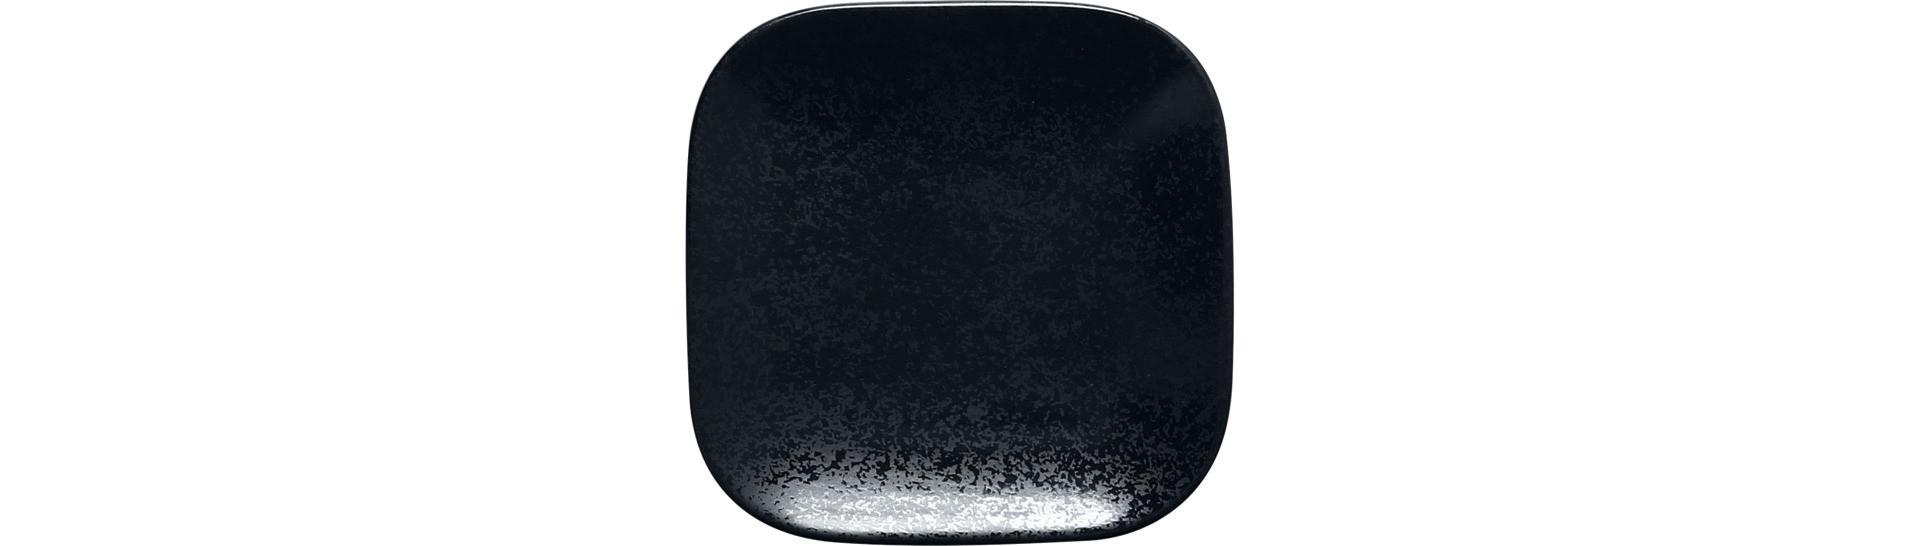 Karbon, Teller quadratisch 110 x 110 mm